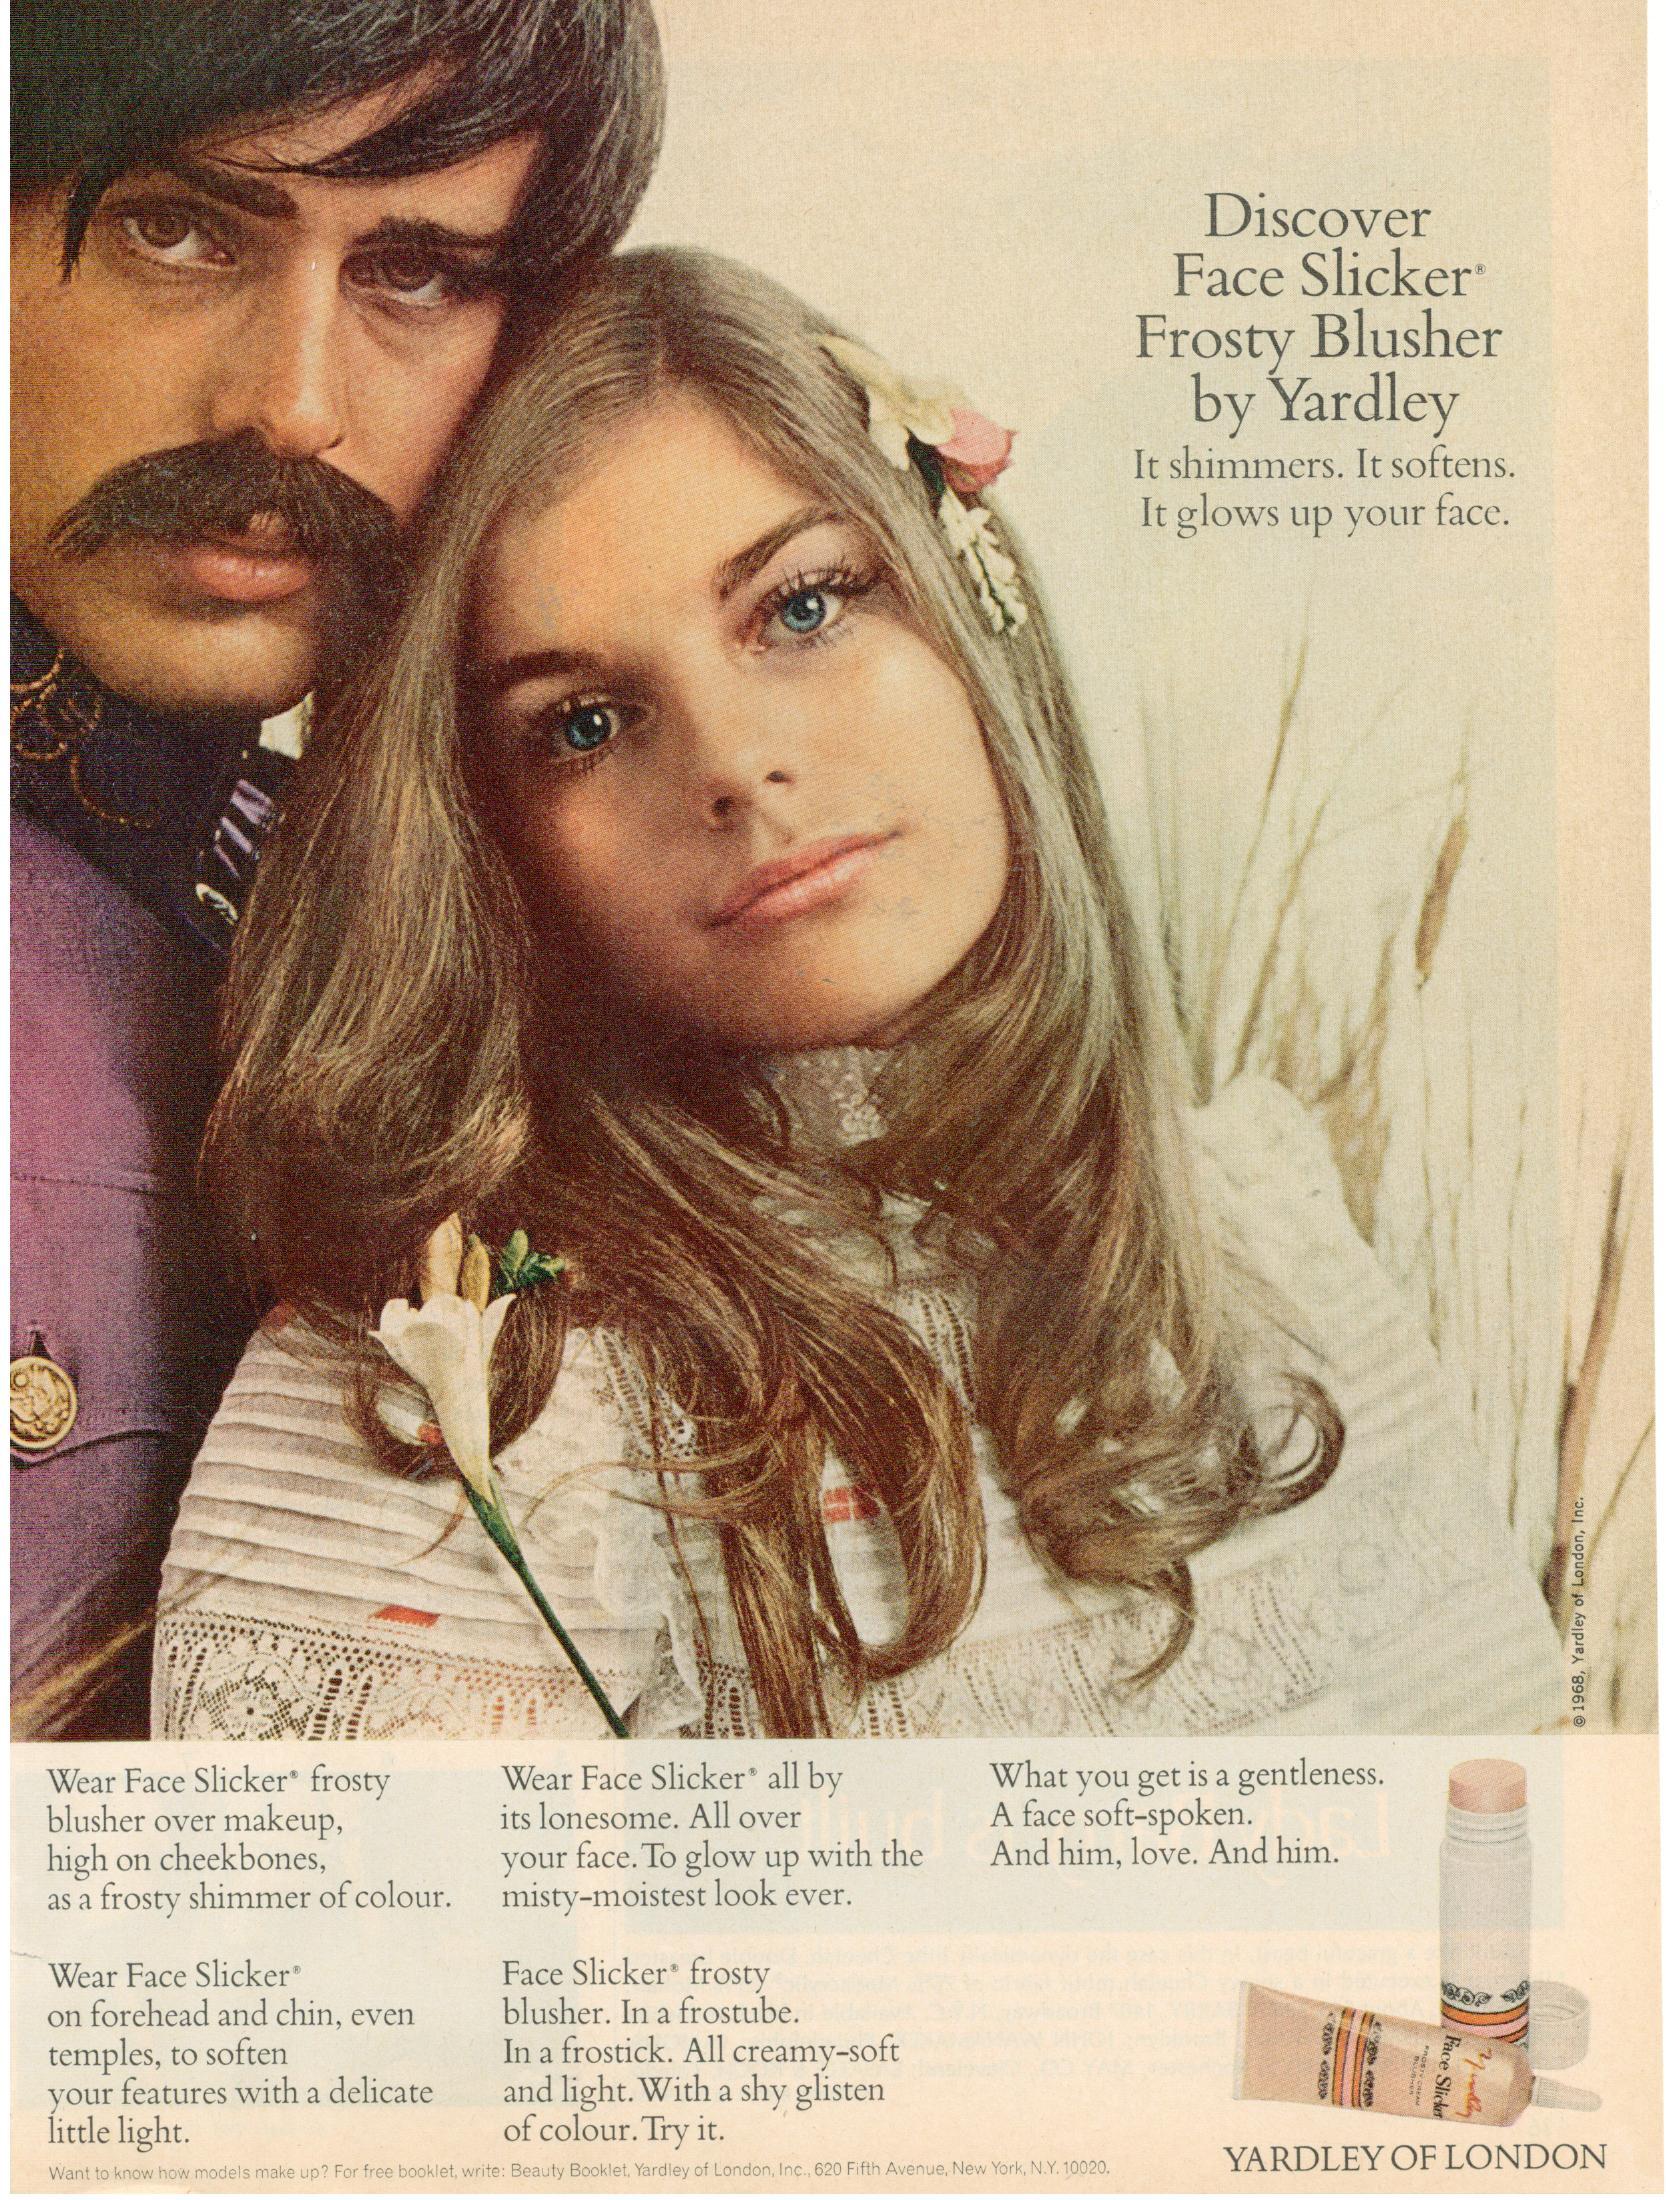 Bruce weber (!) and Patsy Sullivan. yardley-of-london Slicker